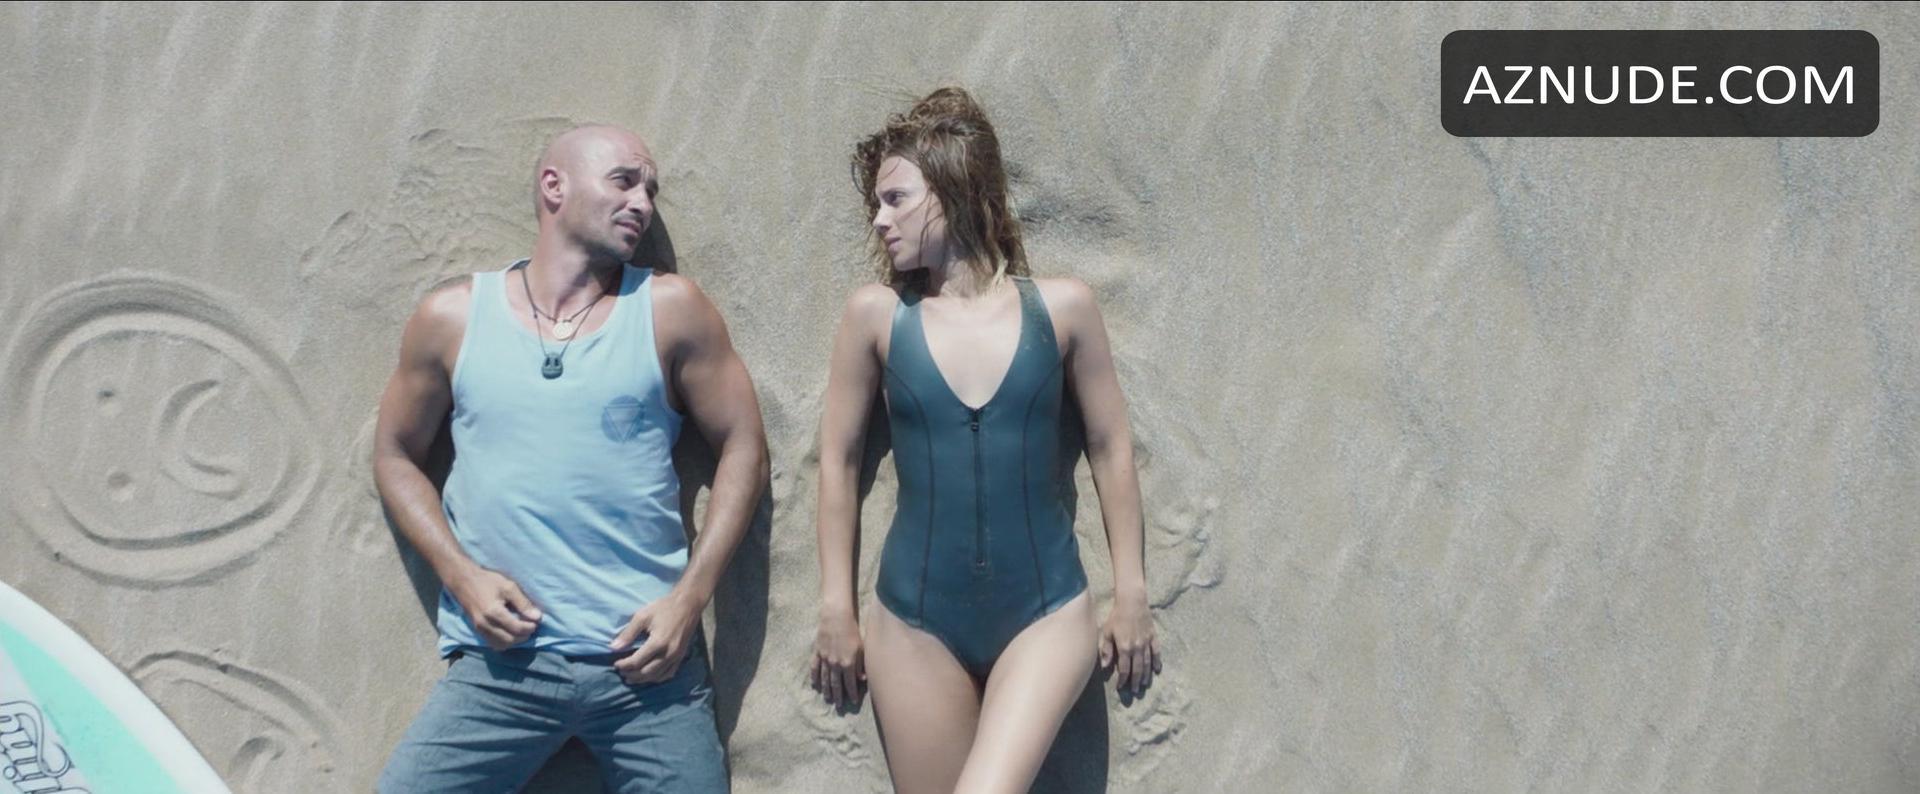 Aura Garrido Nude aura garrido nude - aznude